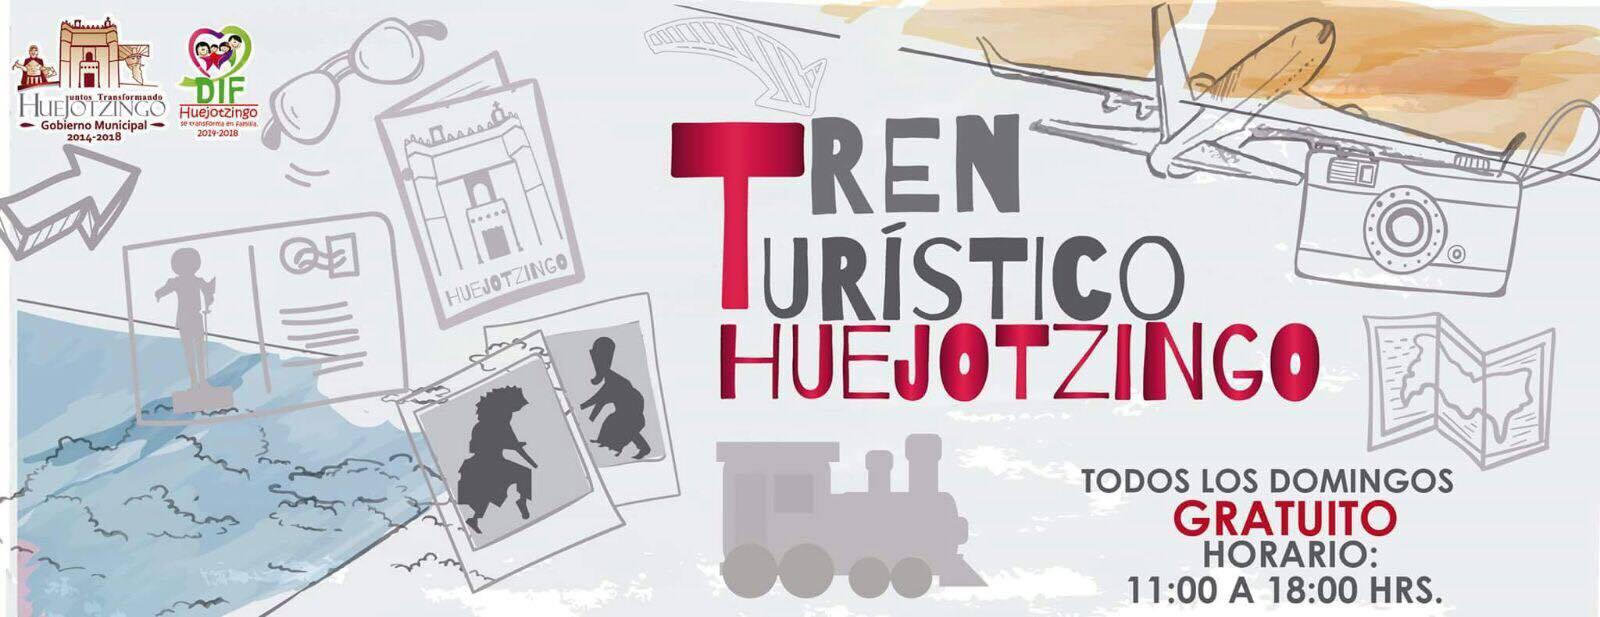 Tren Turístico de Huejotzingo